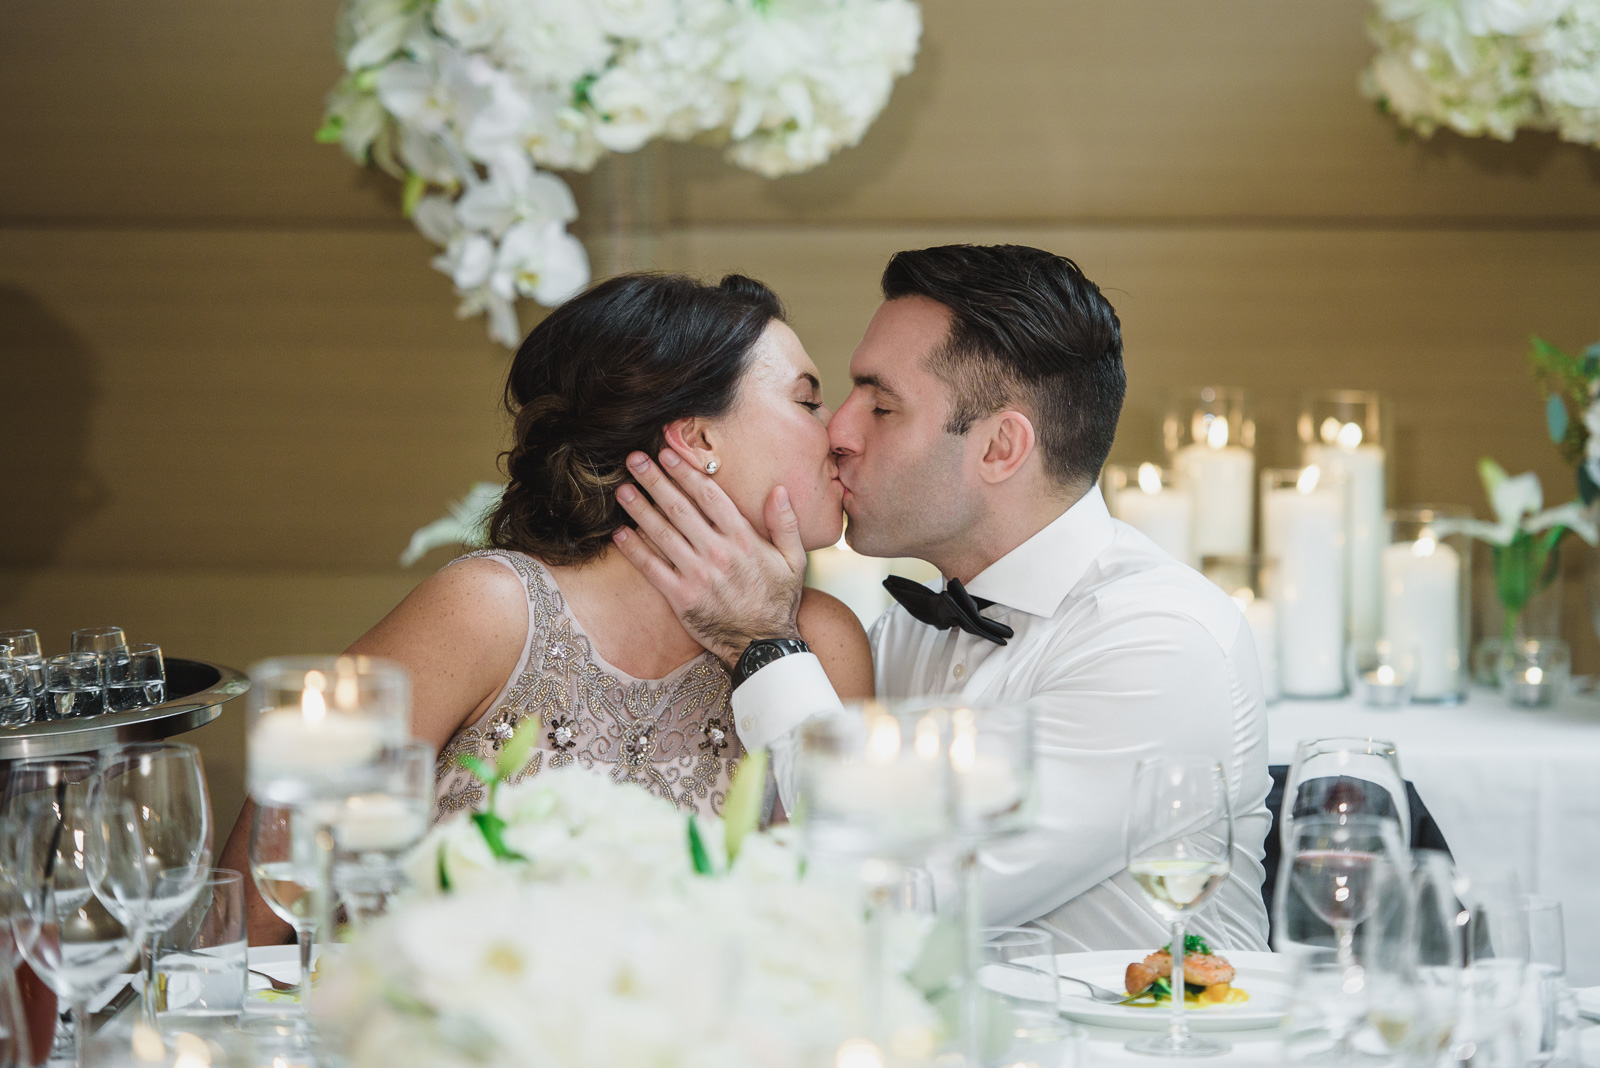 victoria-wedding-photographer-westwood-plateau-wedding-31.jpg